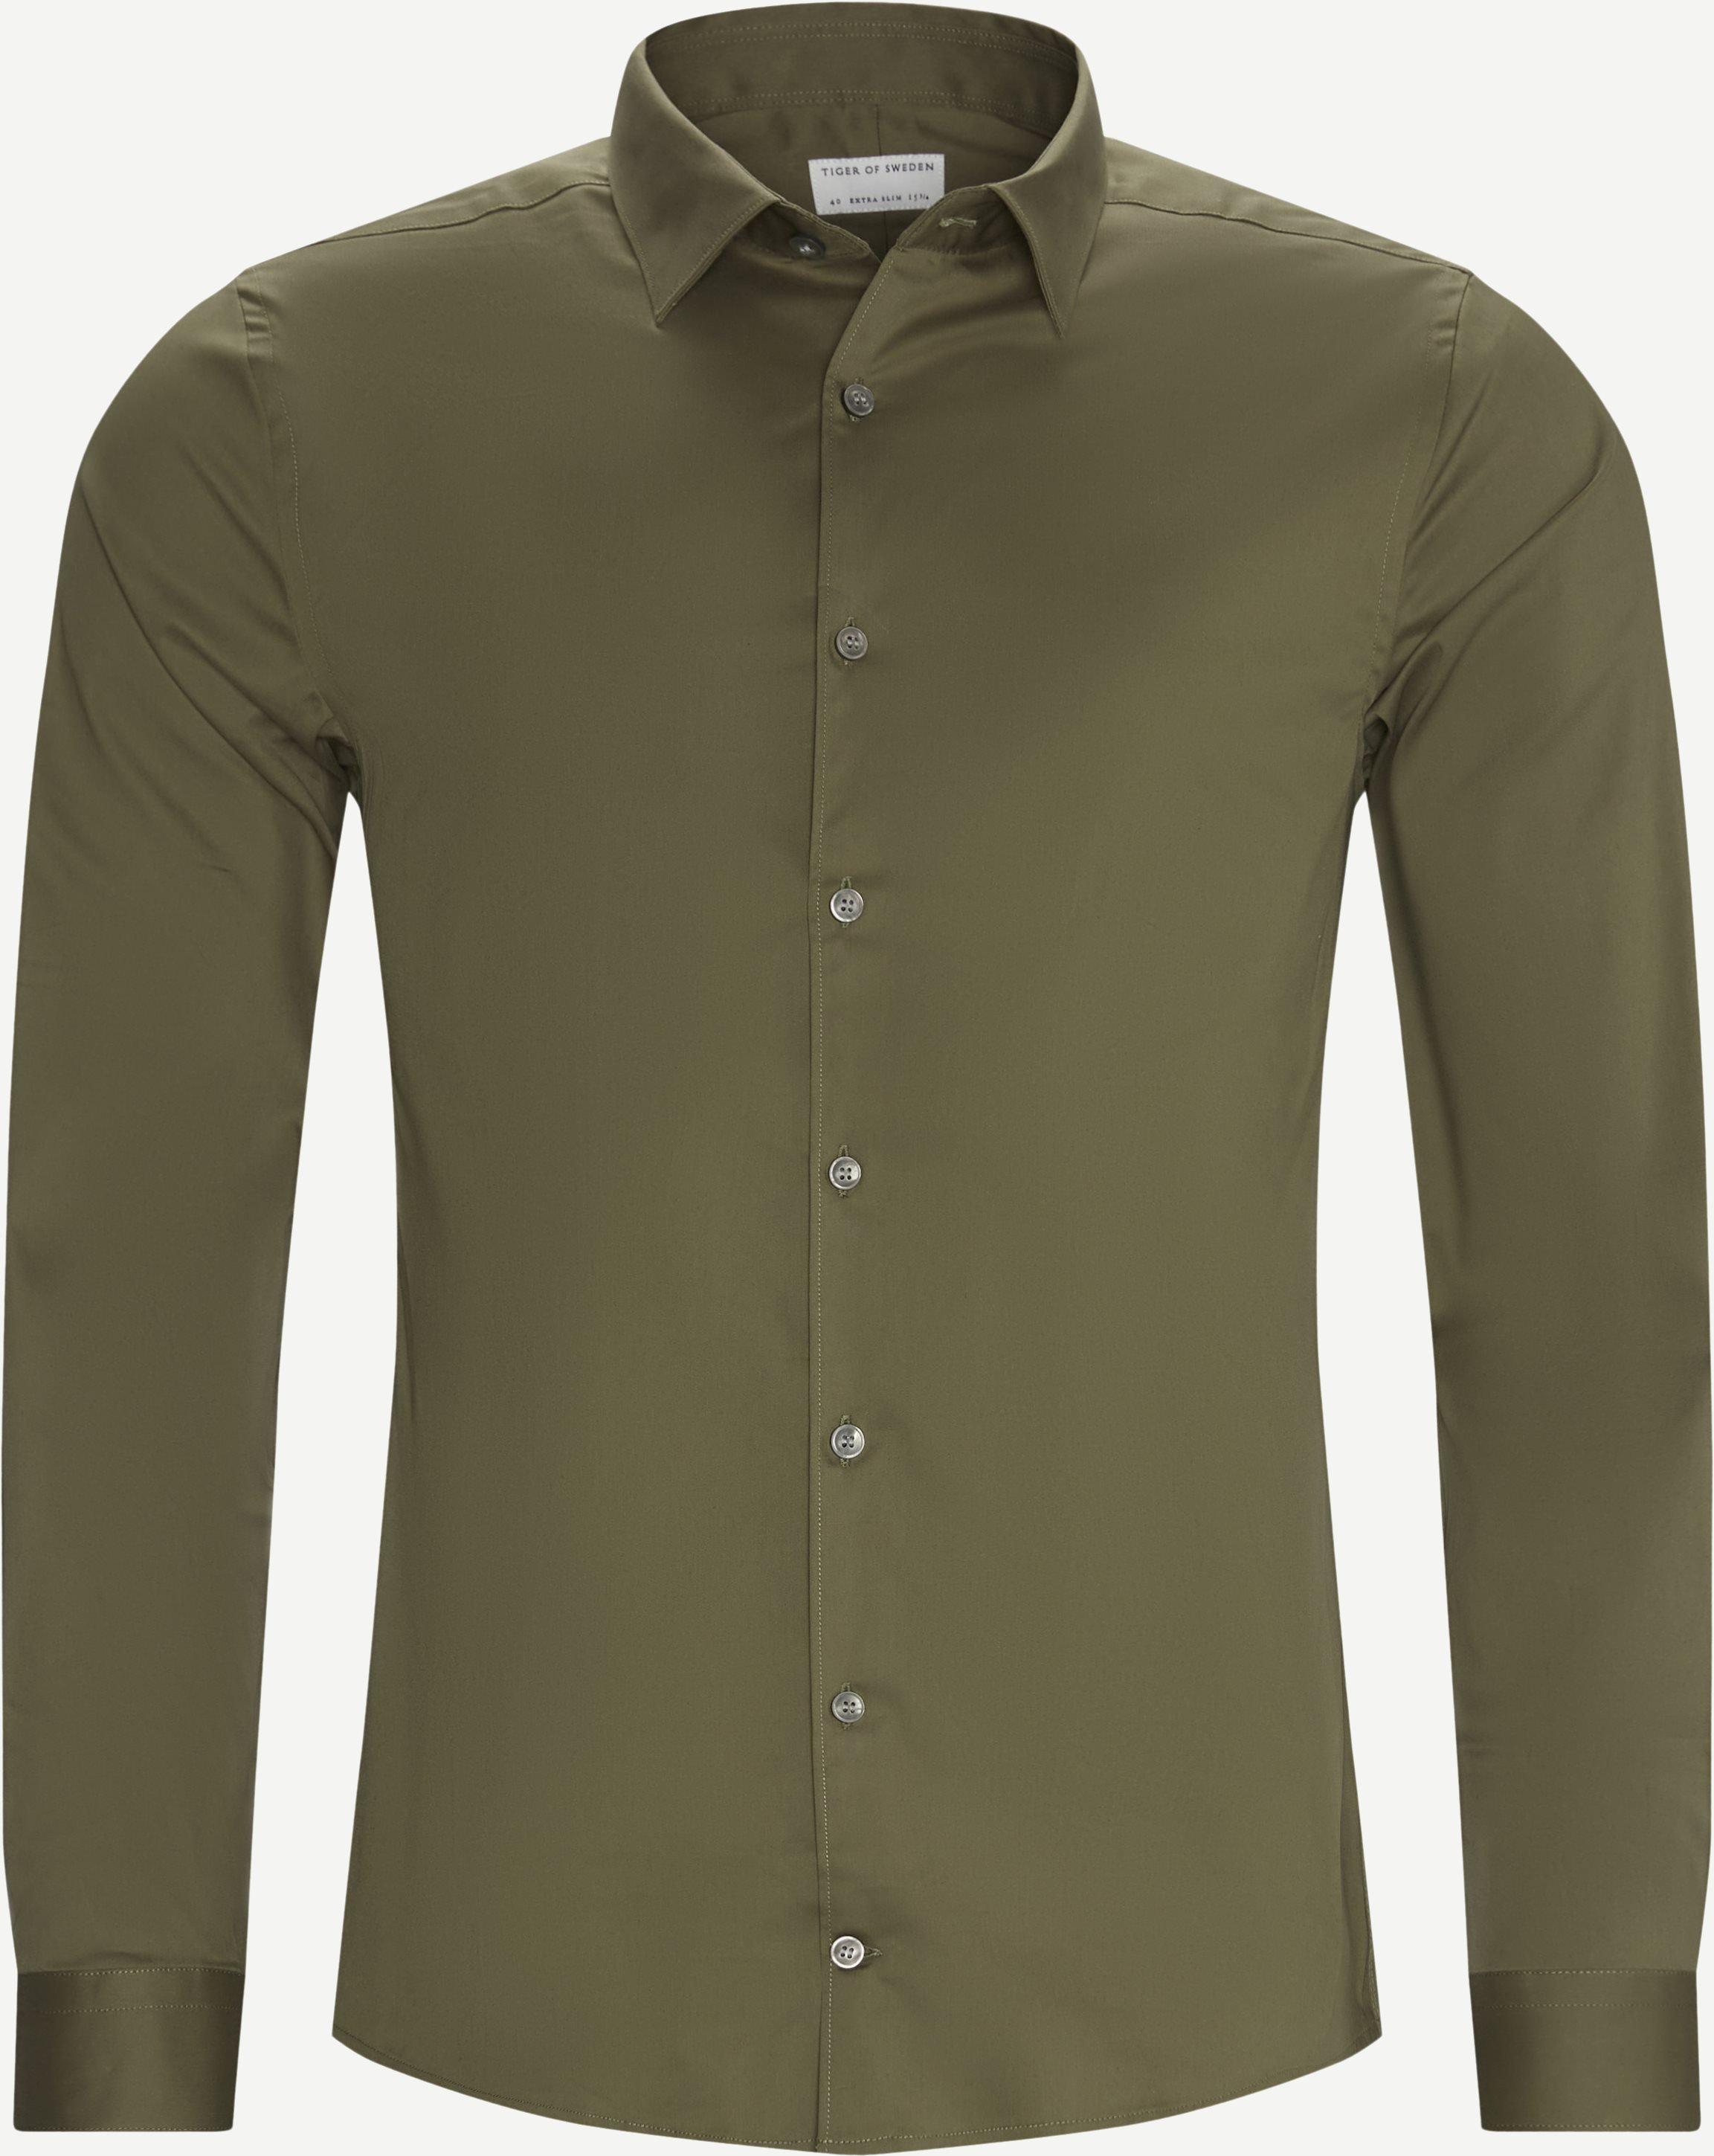 Filbrodie Skjorte - Skjorter - Ekstra slim fit - Army